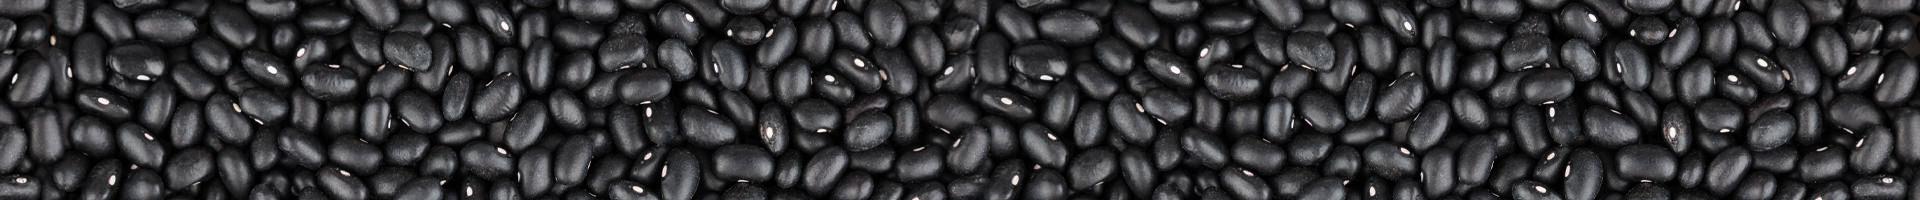 black beans Oh!